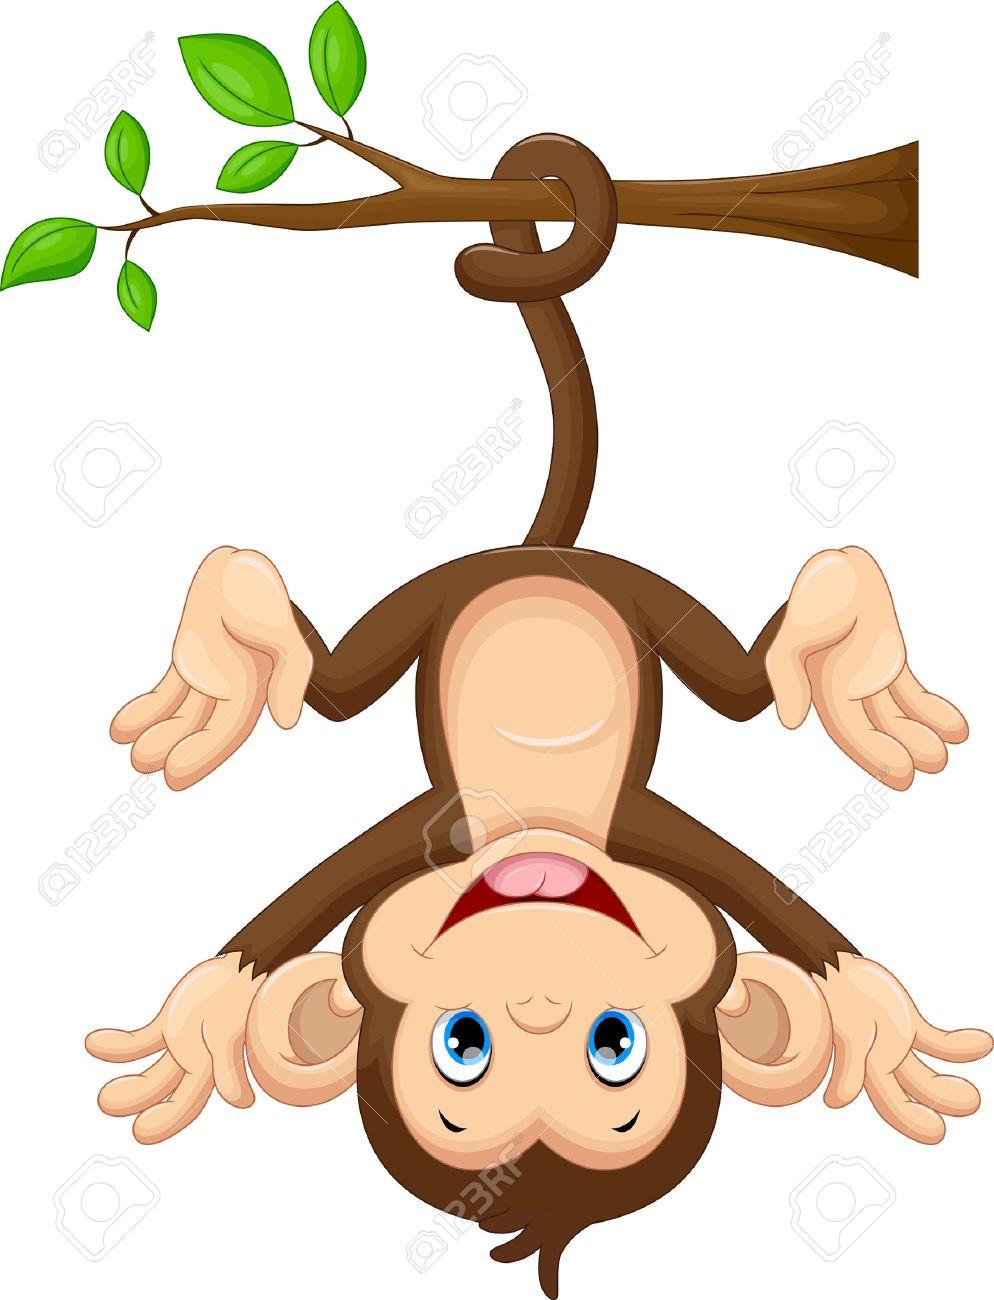 Cute baby monkey hanging on tree - 50993716